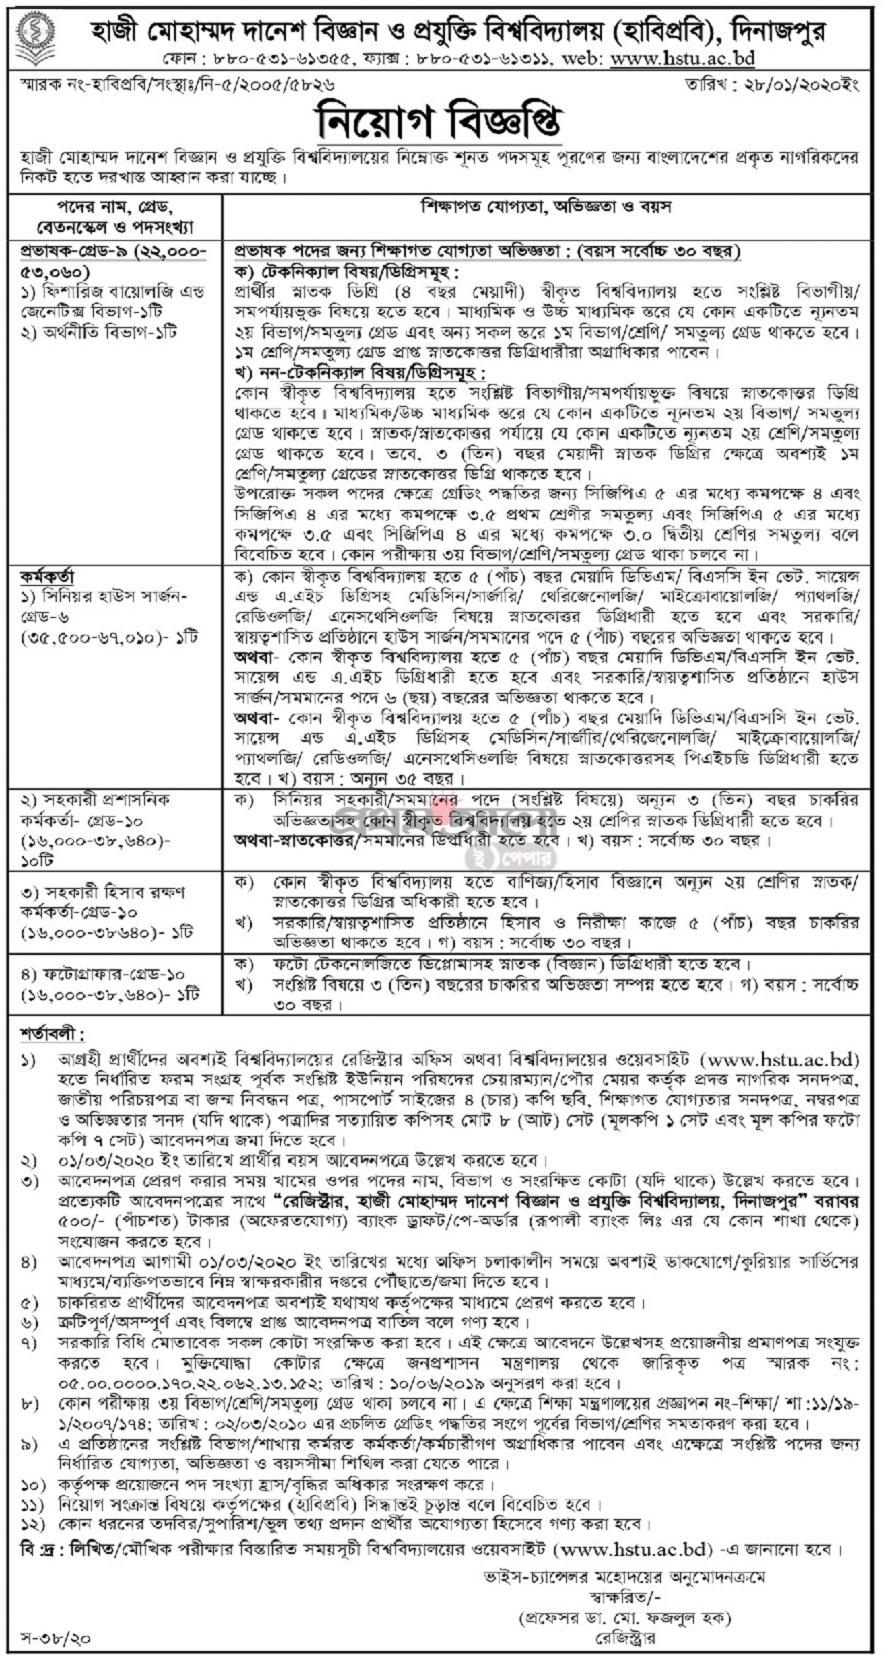 Hajee Mohammad Danesh Science and Technology University Job Circular 2020